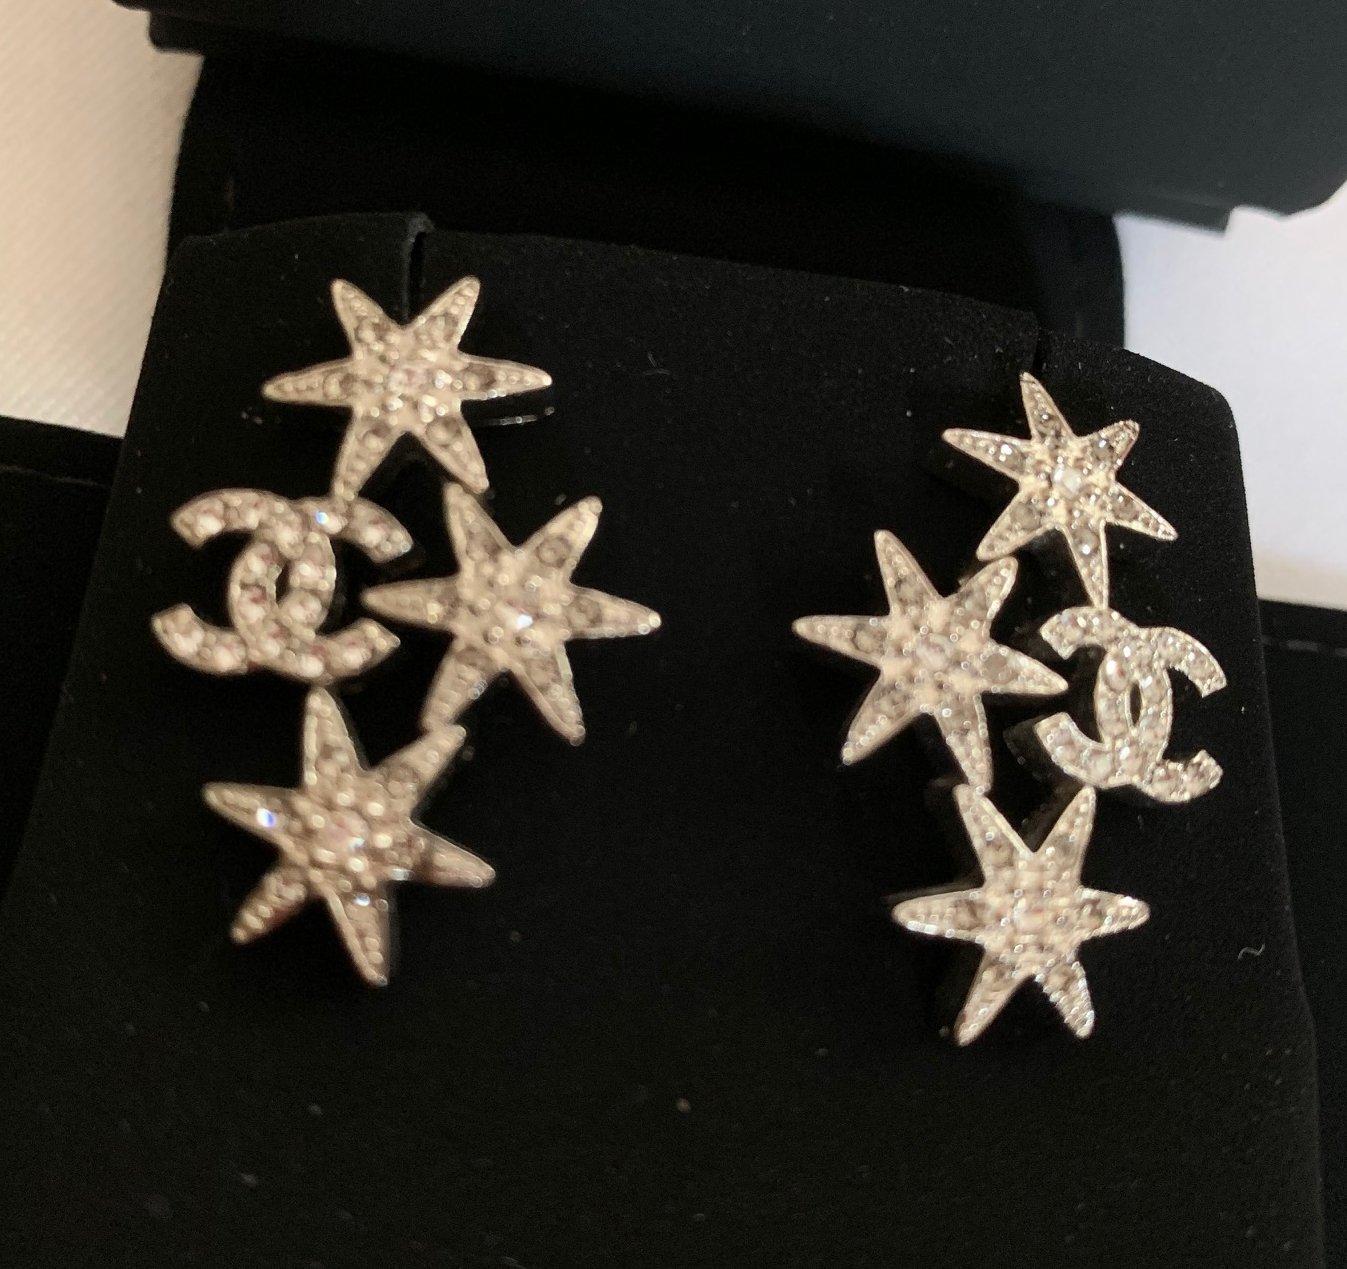 CHANEL CC CRYSTAL STAR Silver Stars Stud Earrings Hallmark Authentic NIB